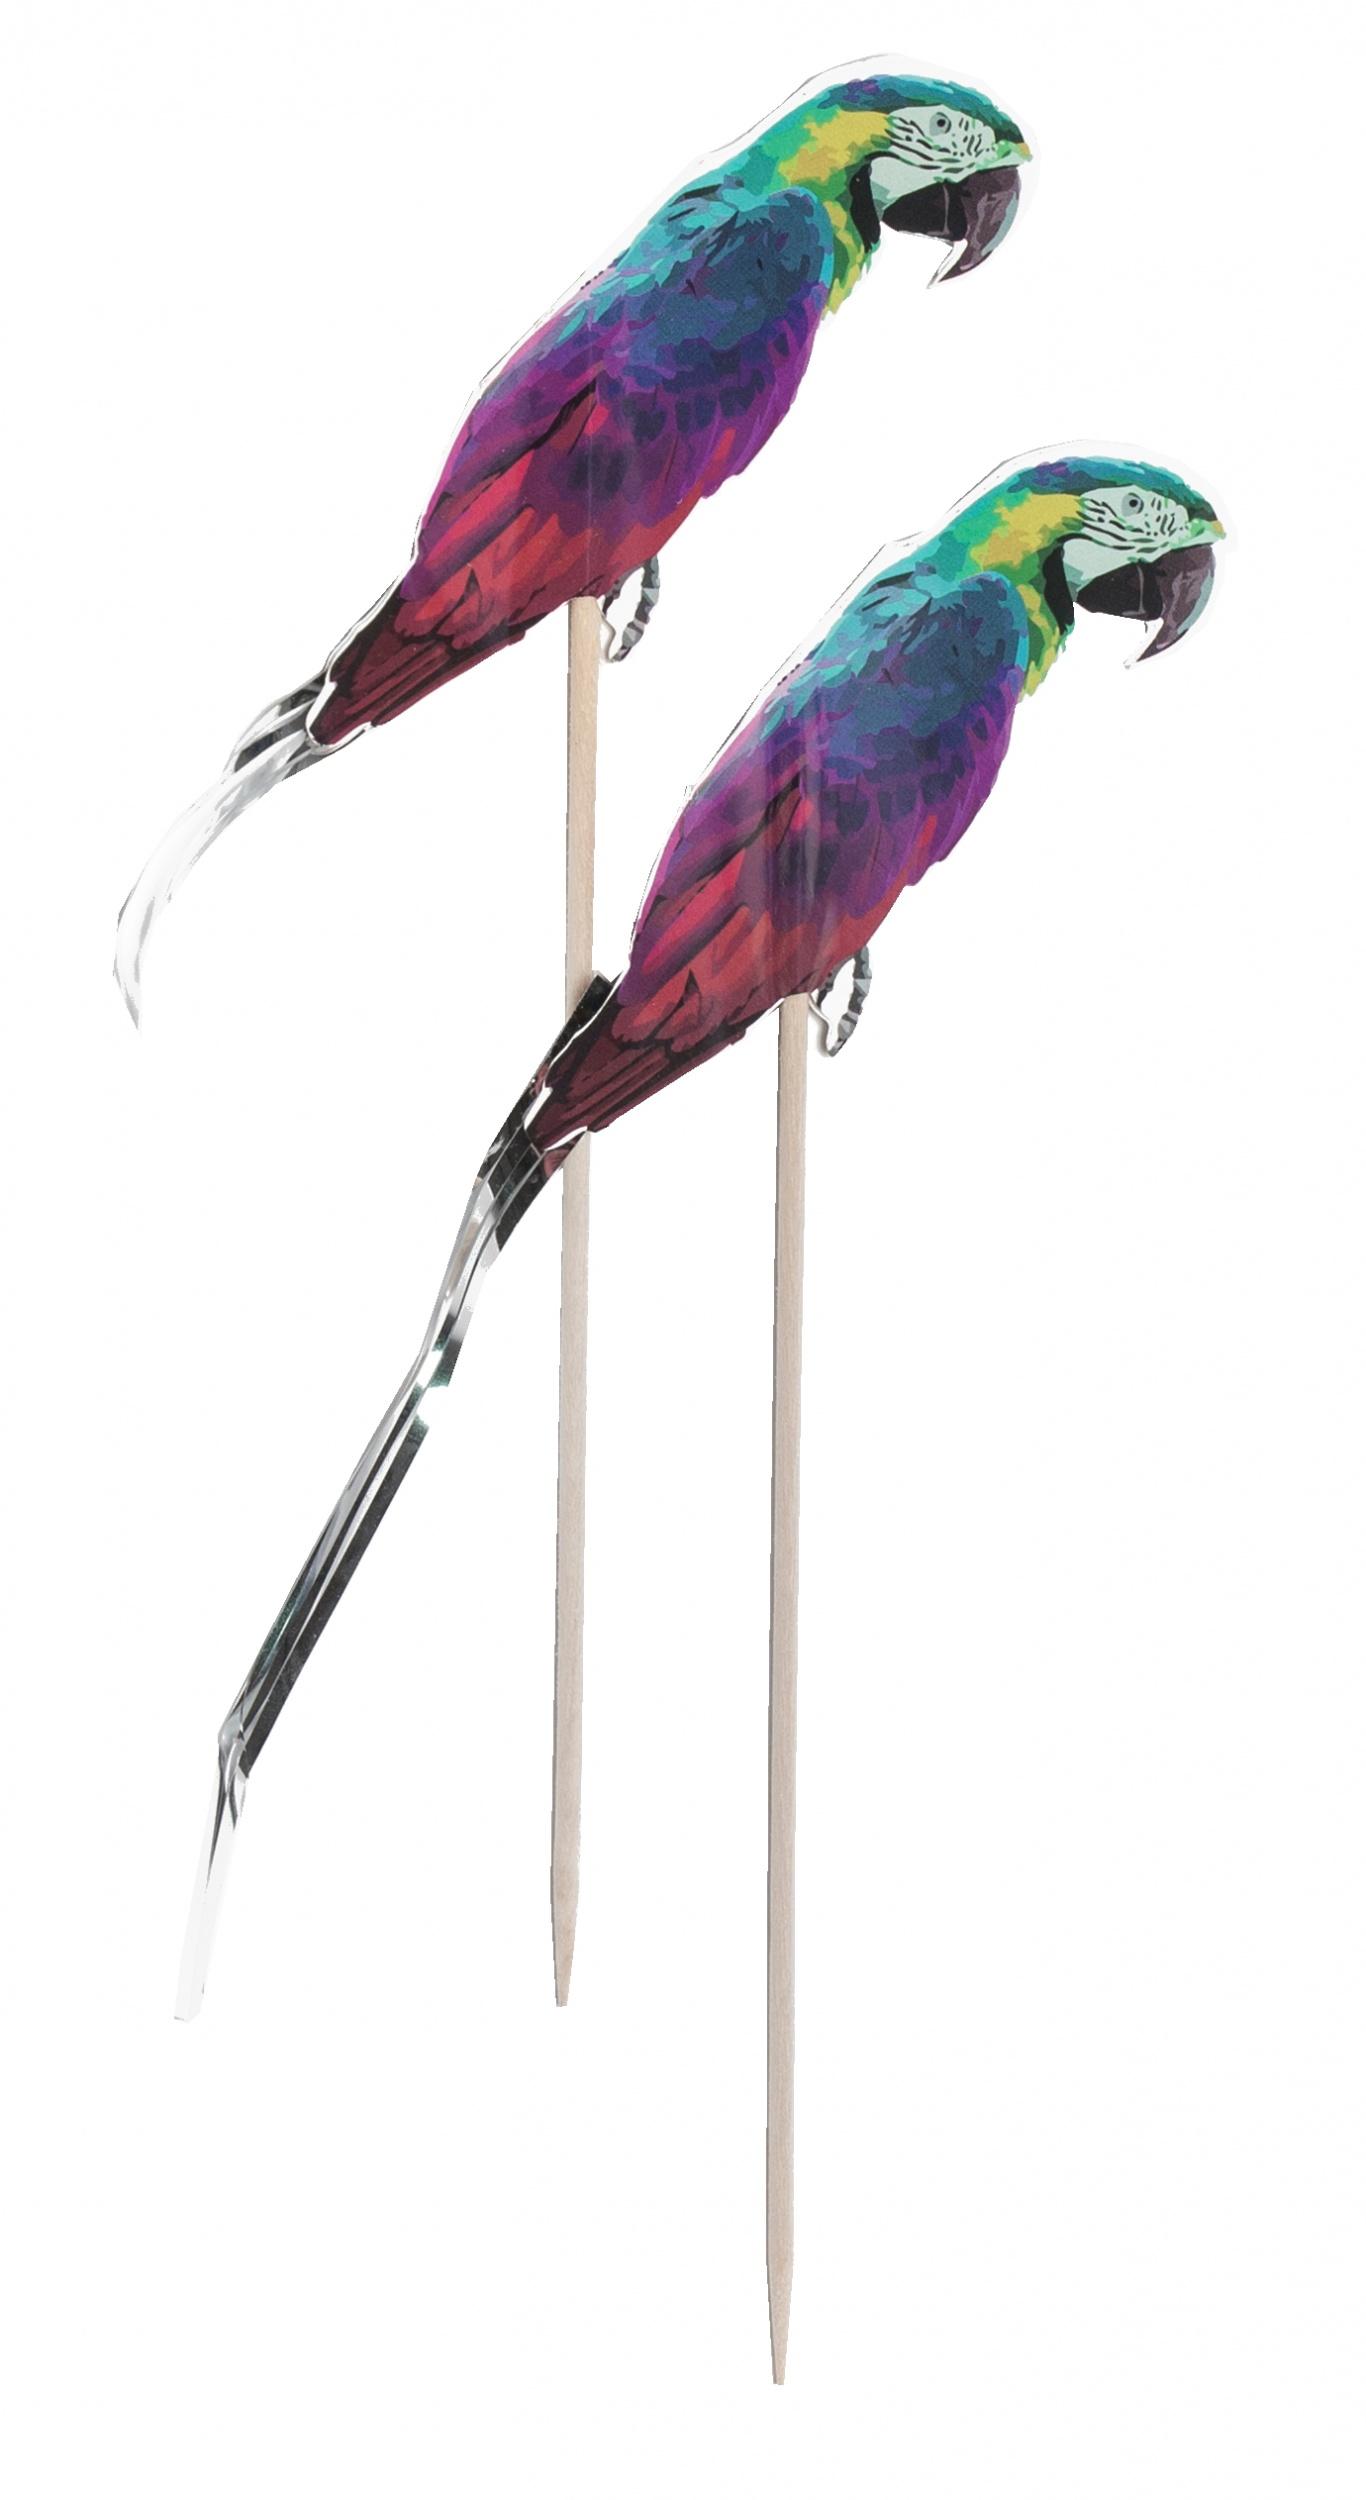 partyprikkers papegaai 10 stuks 15 cm